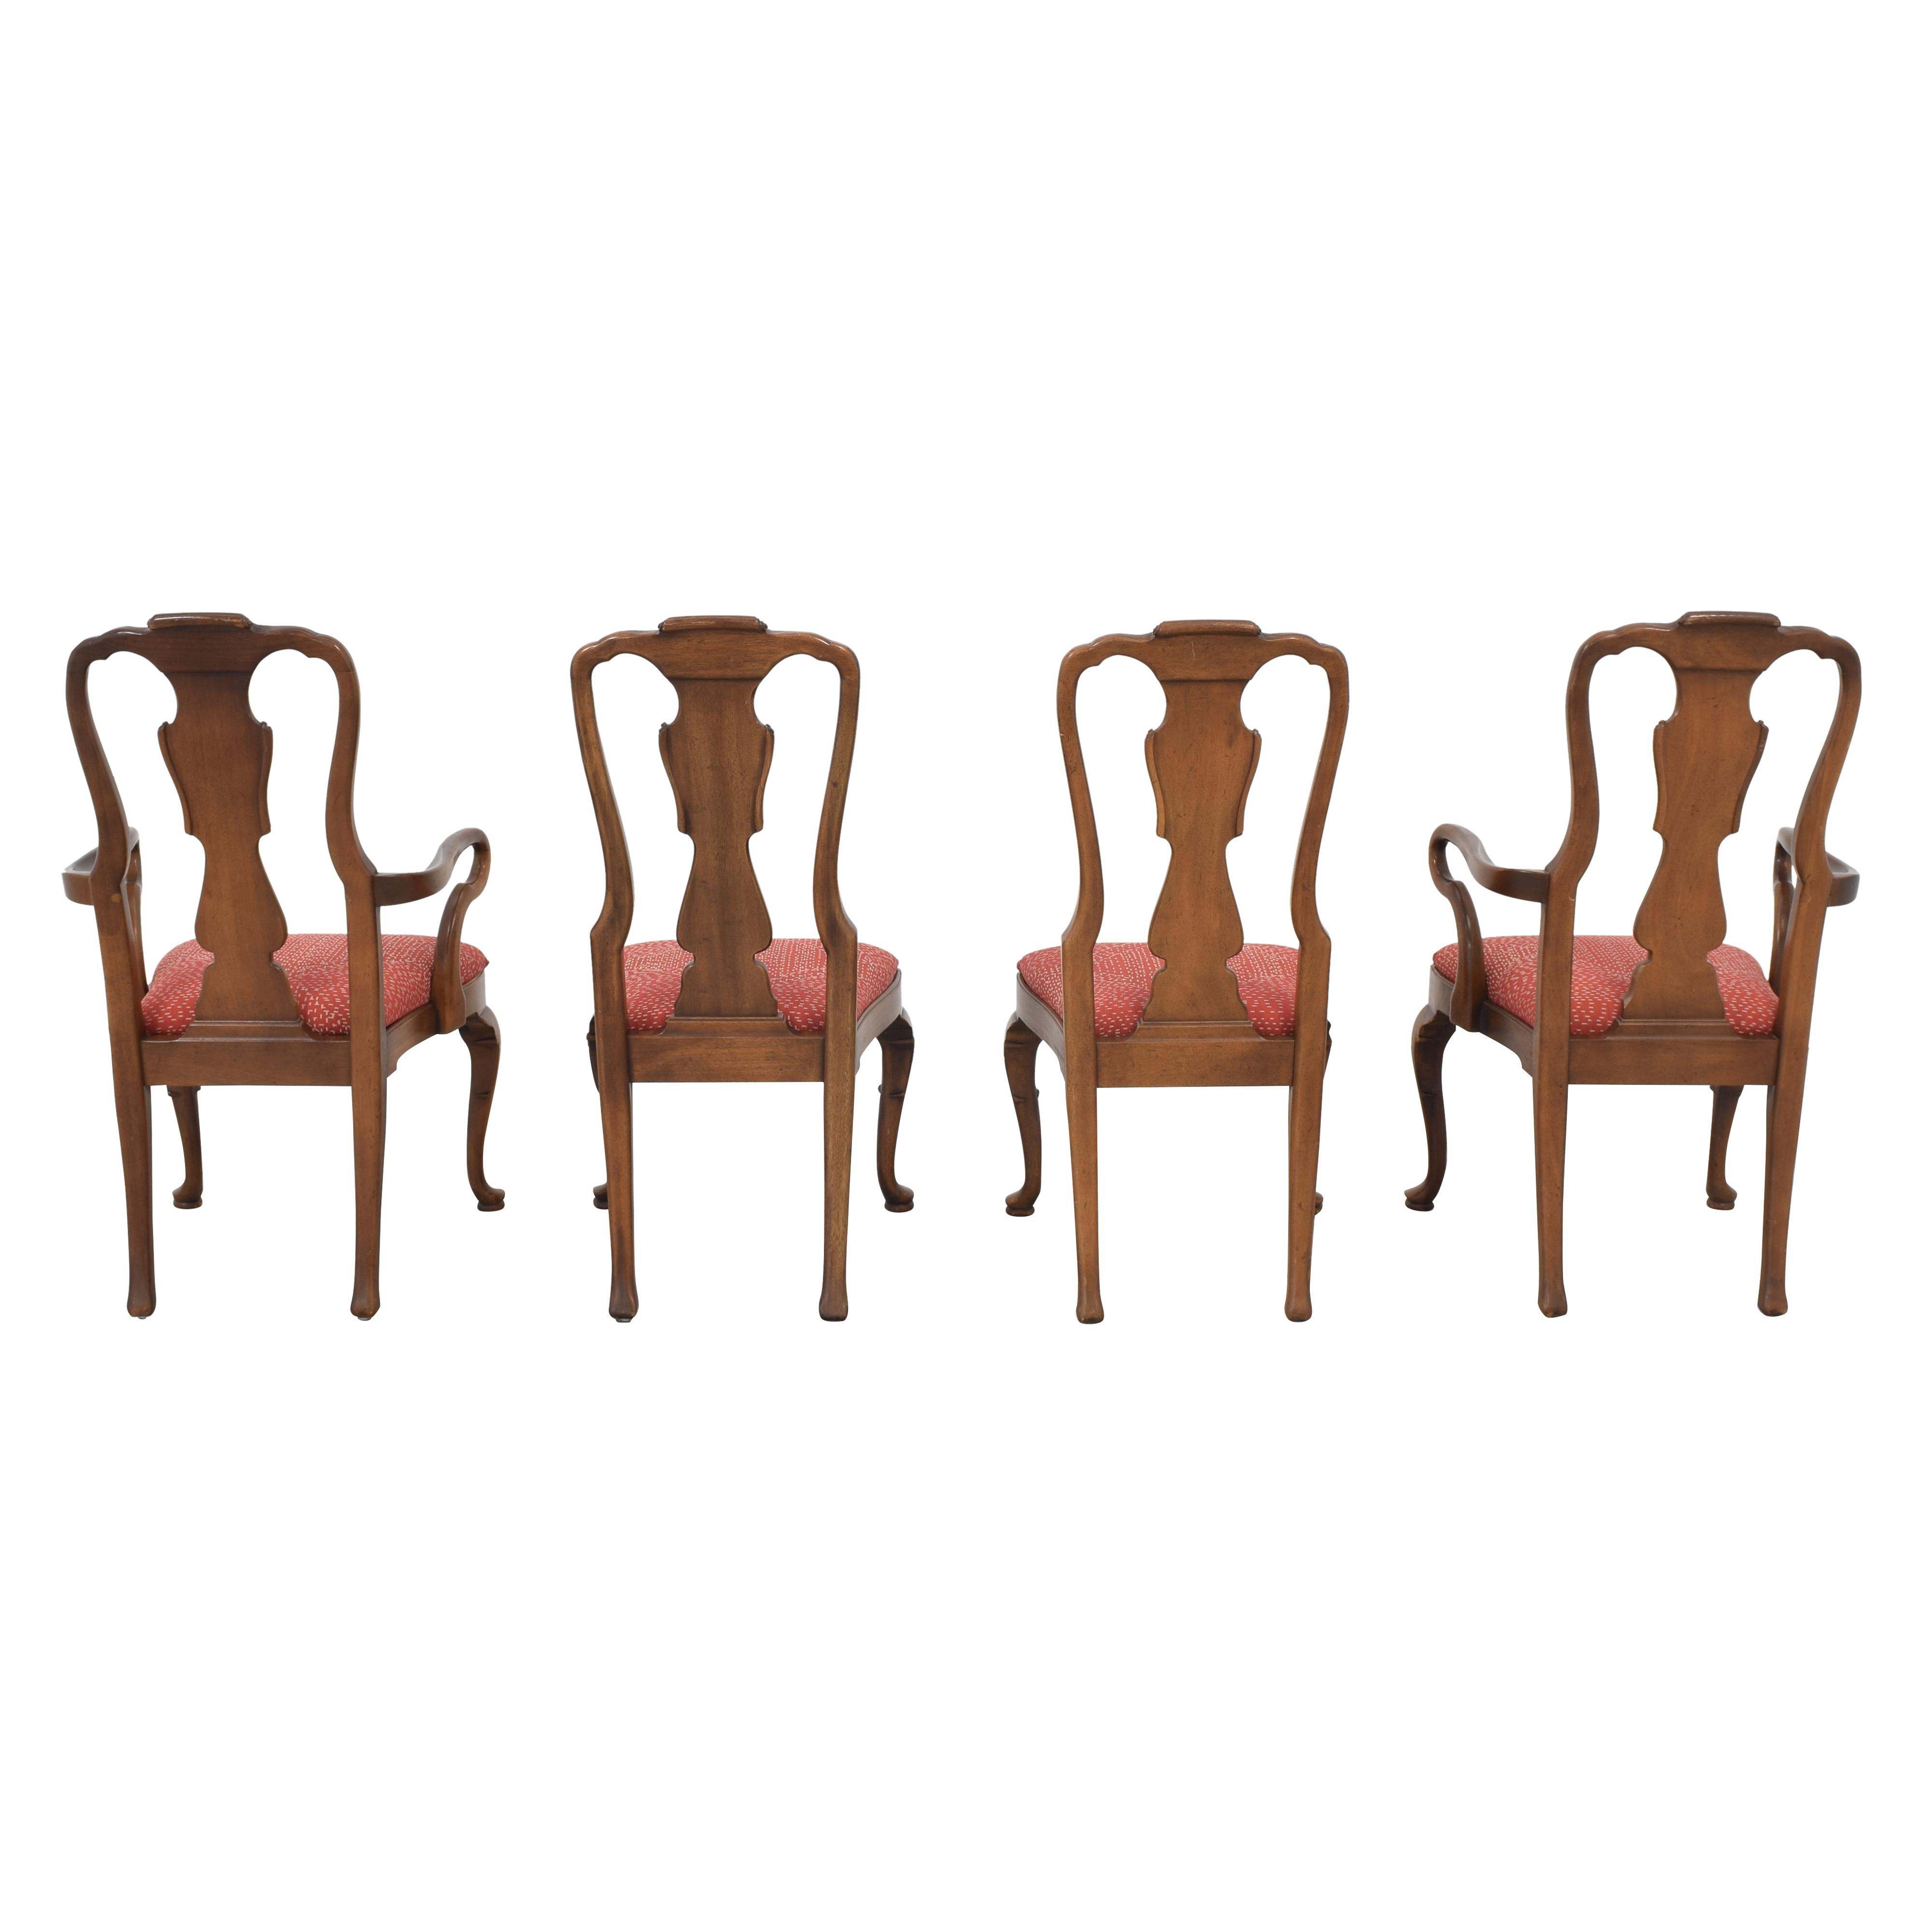 Henredon Furniture Henredon Queen Anne Chairs Chairs